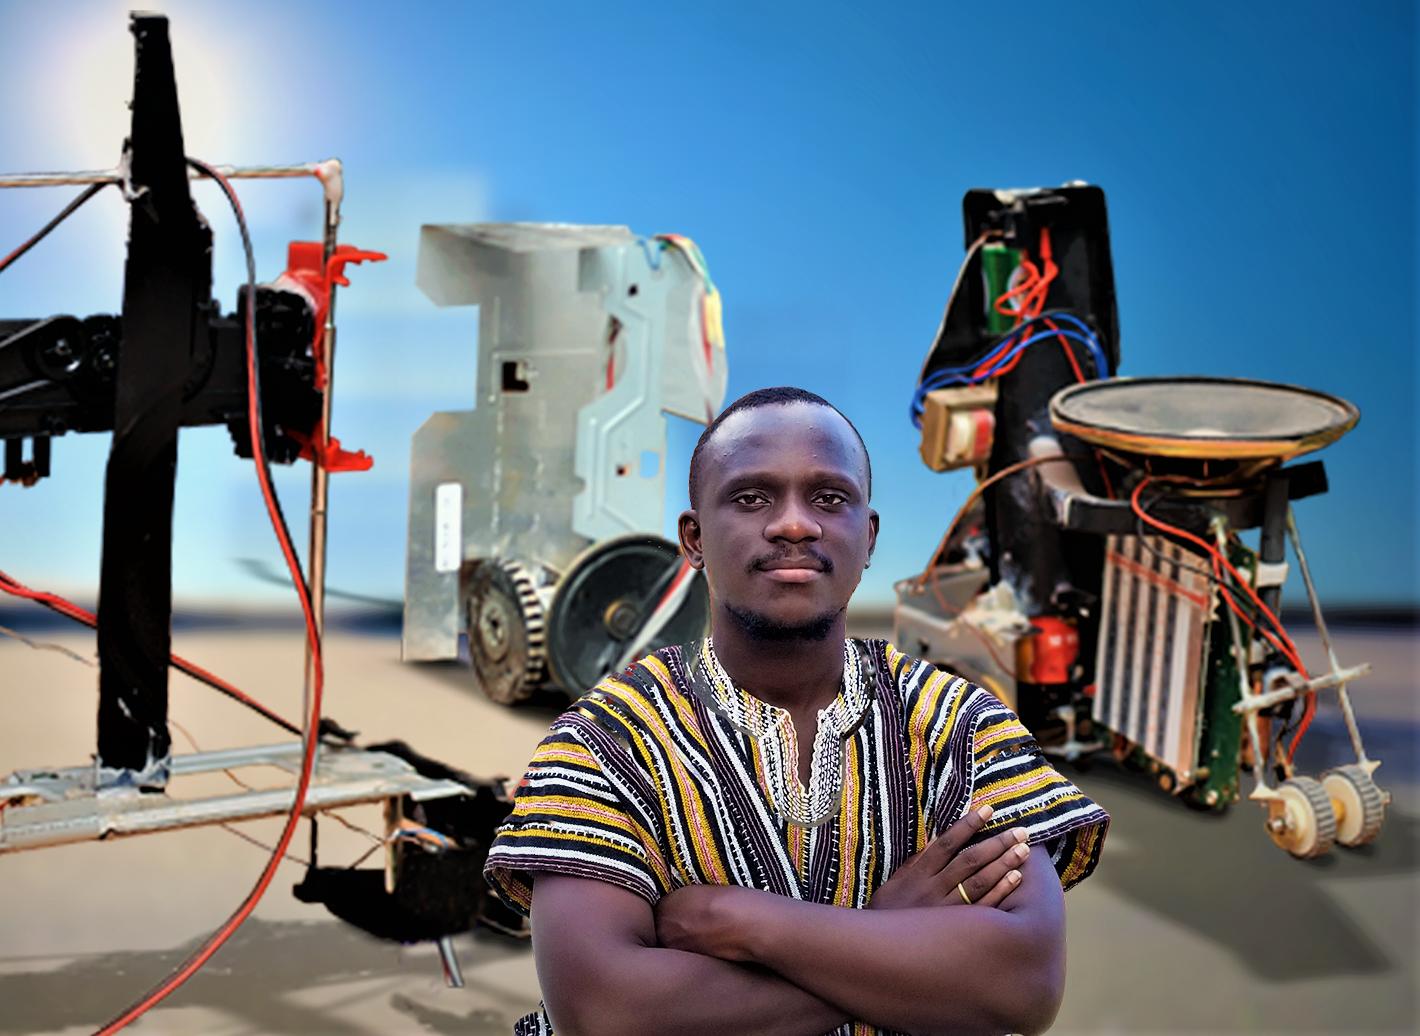 Akwasi Bediako Afrane